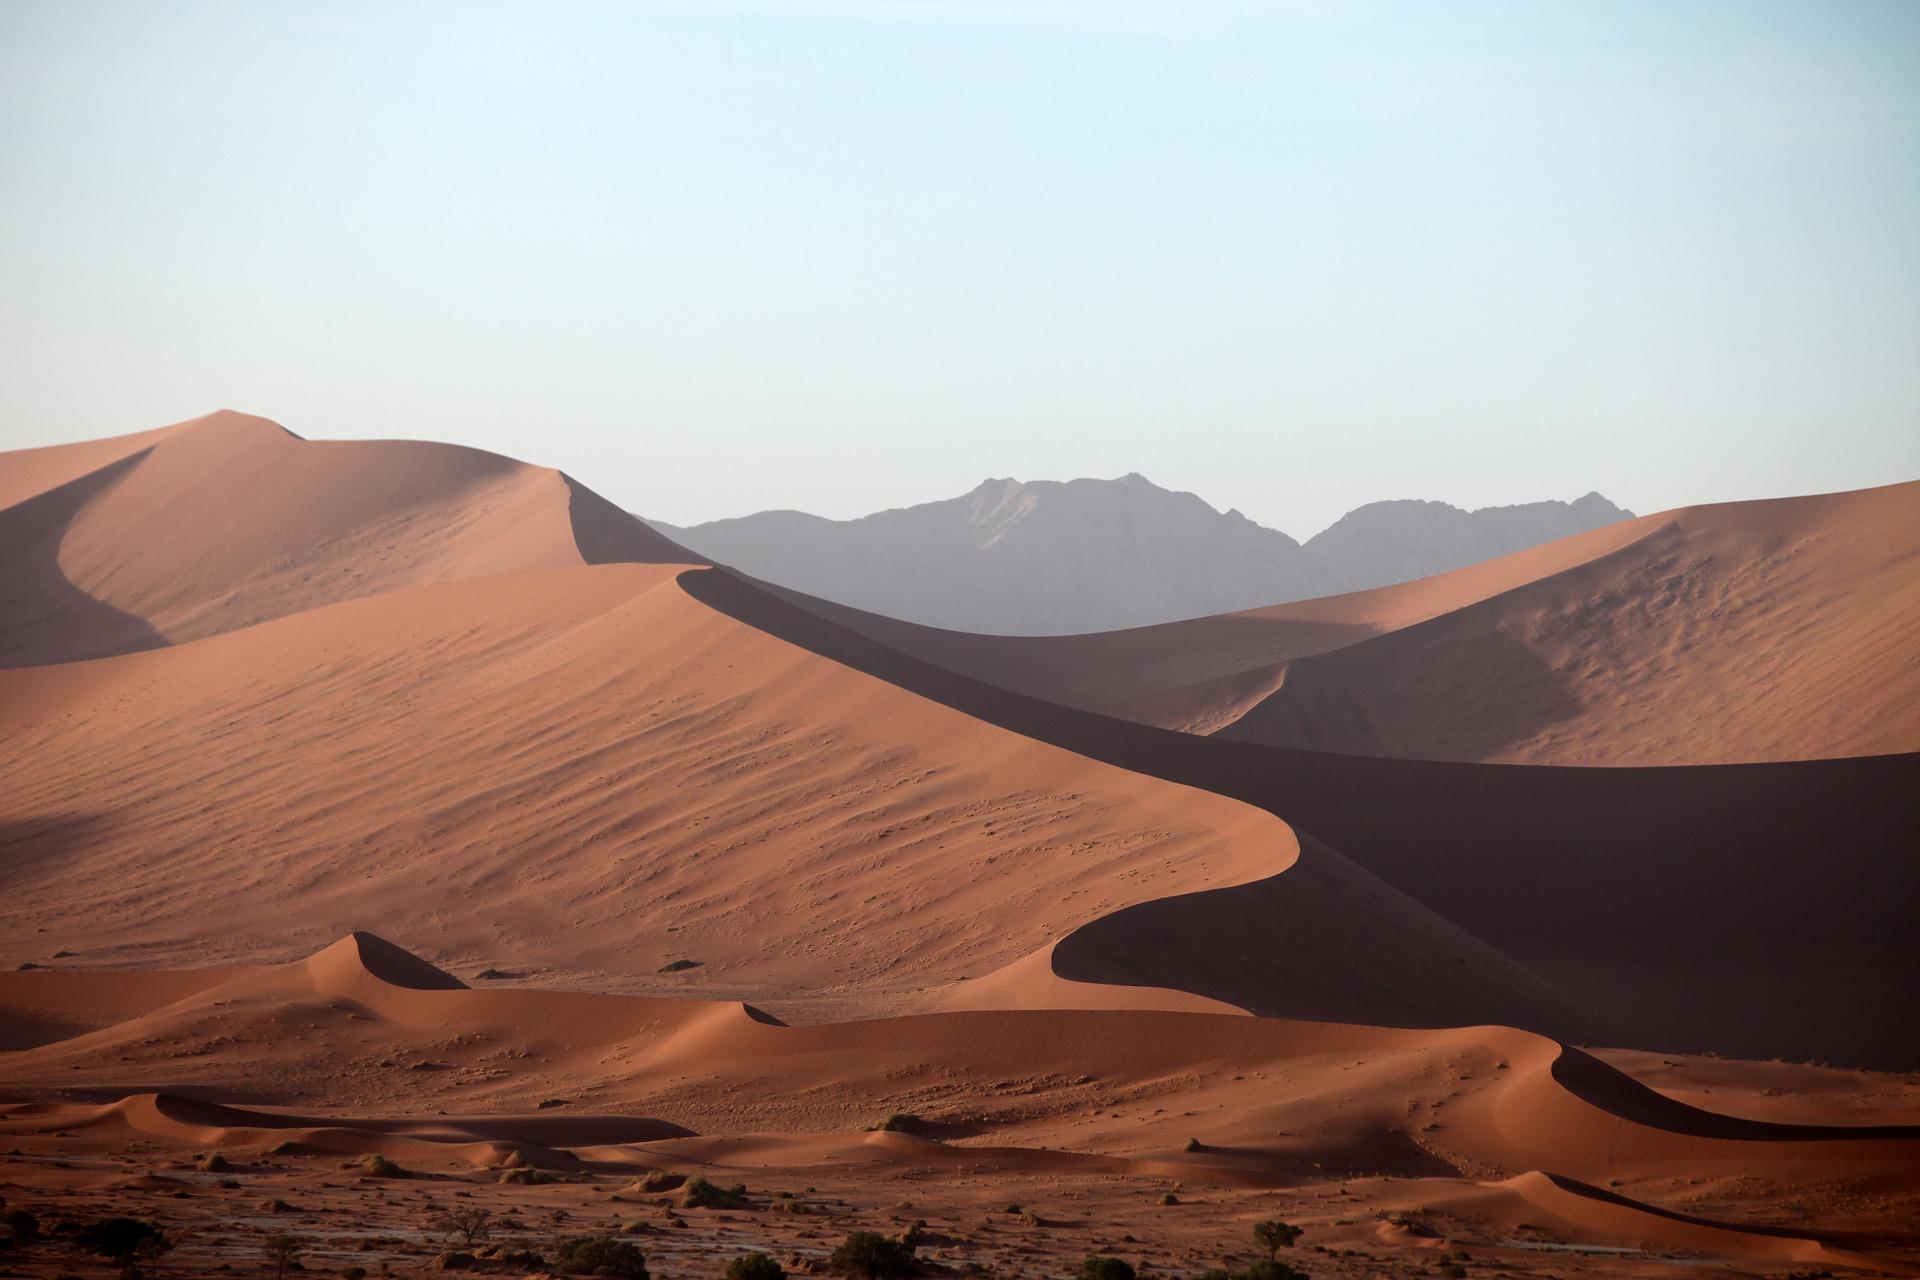 Namibian desert and majestic sand dunes.